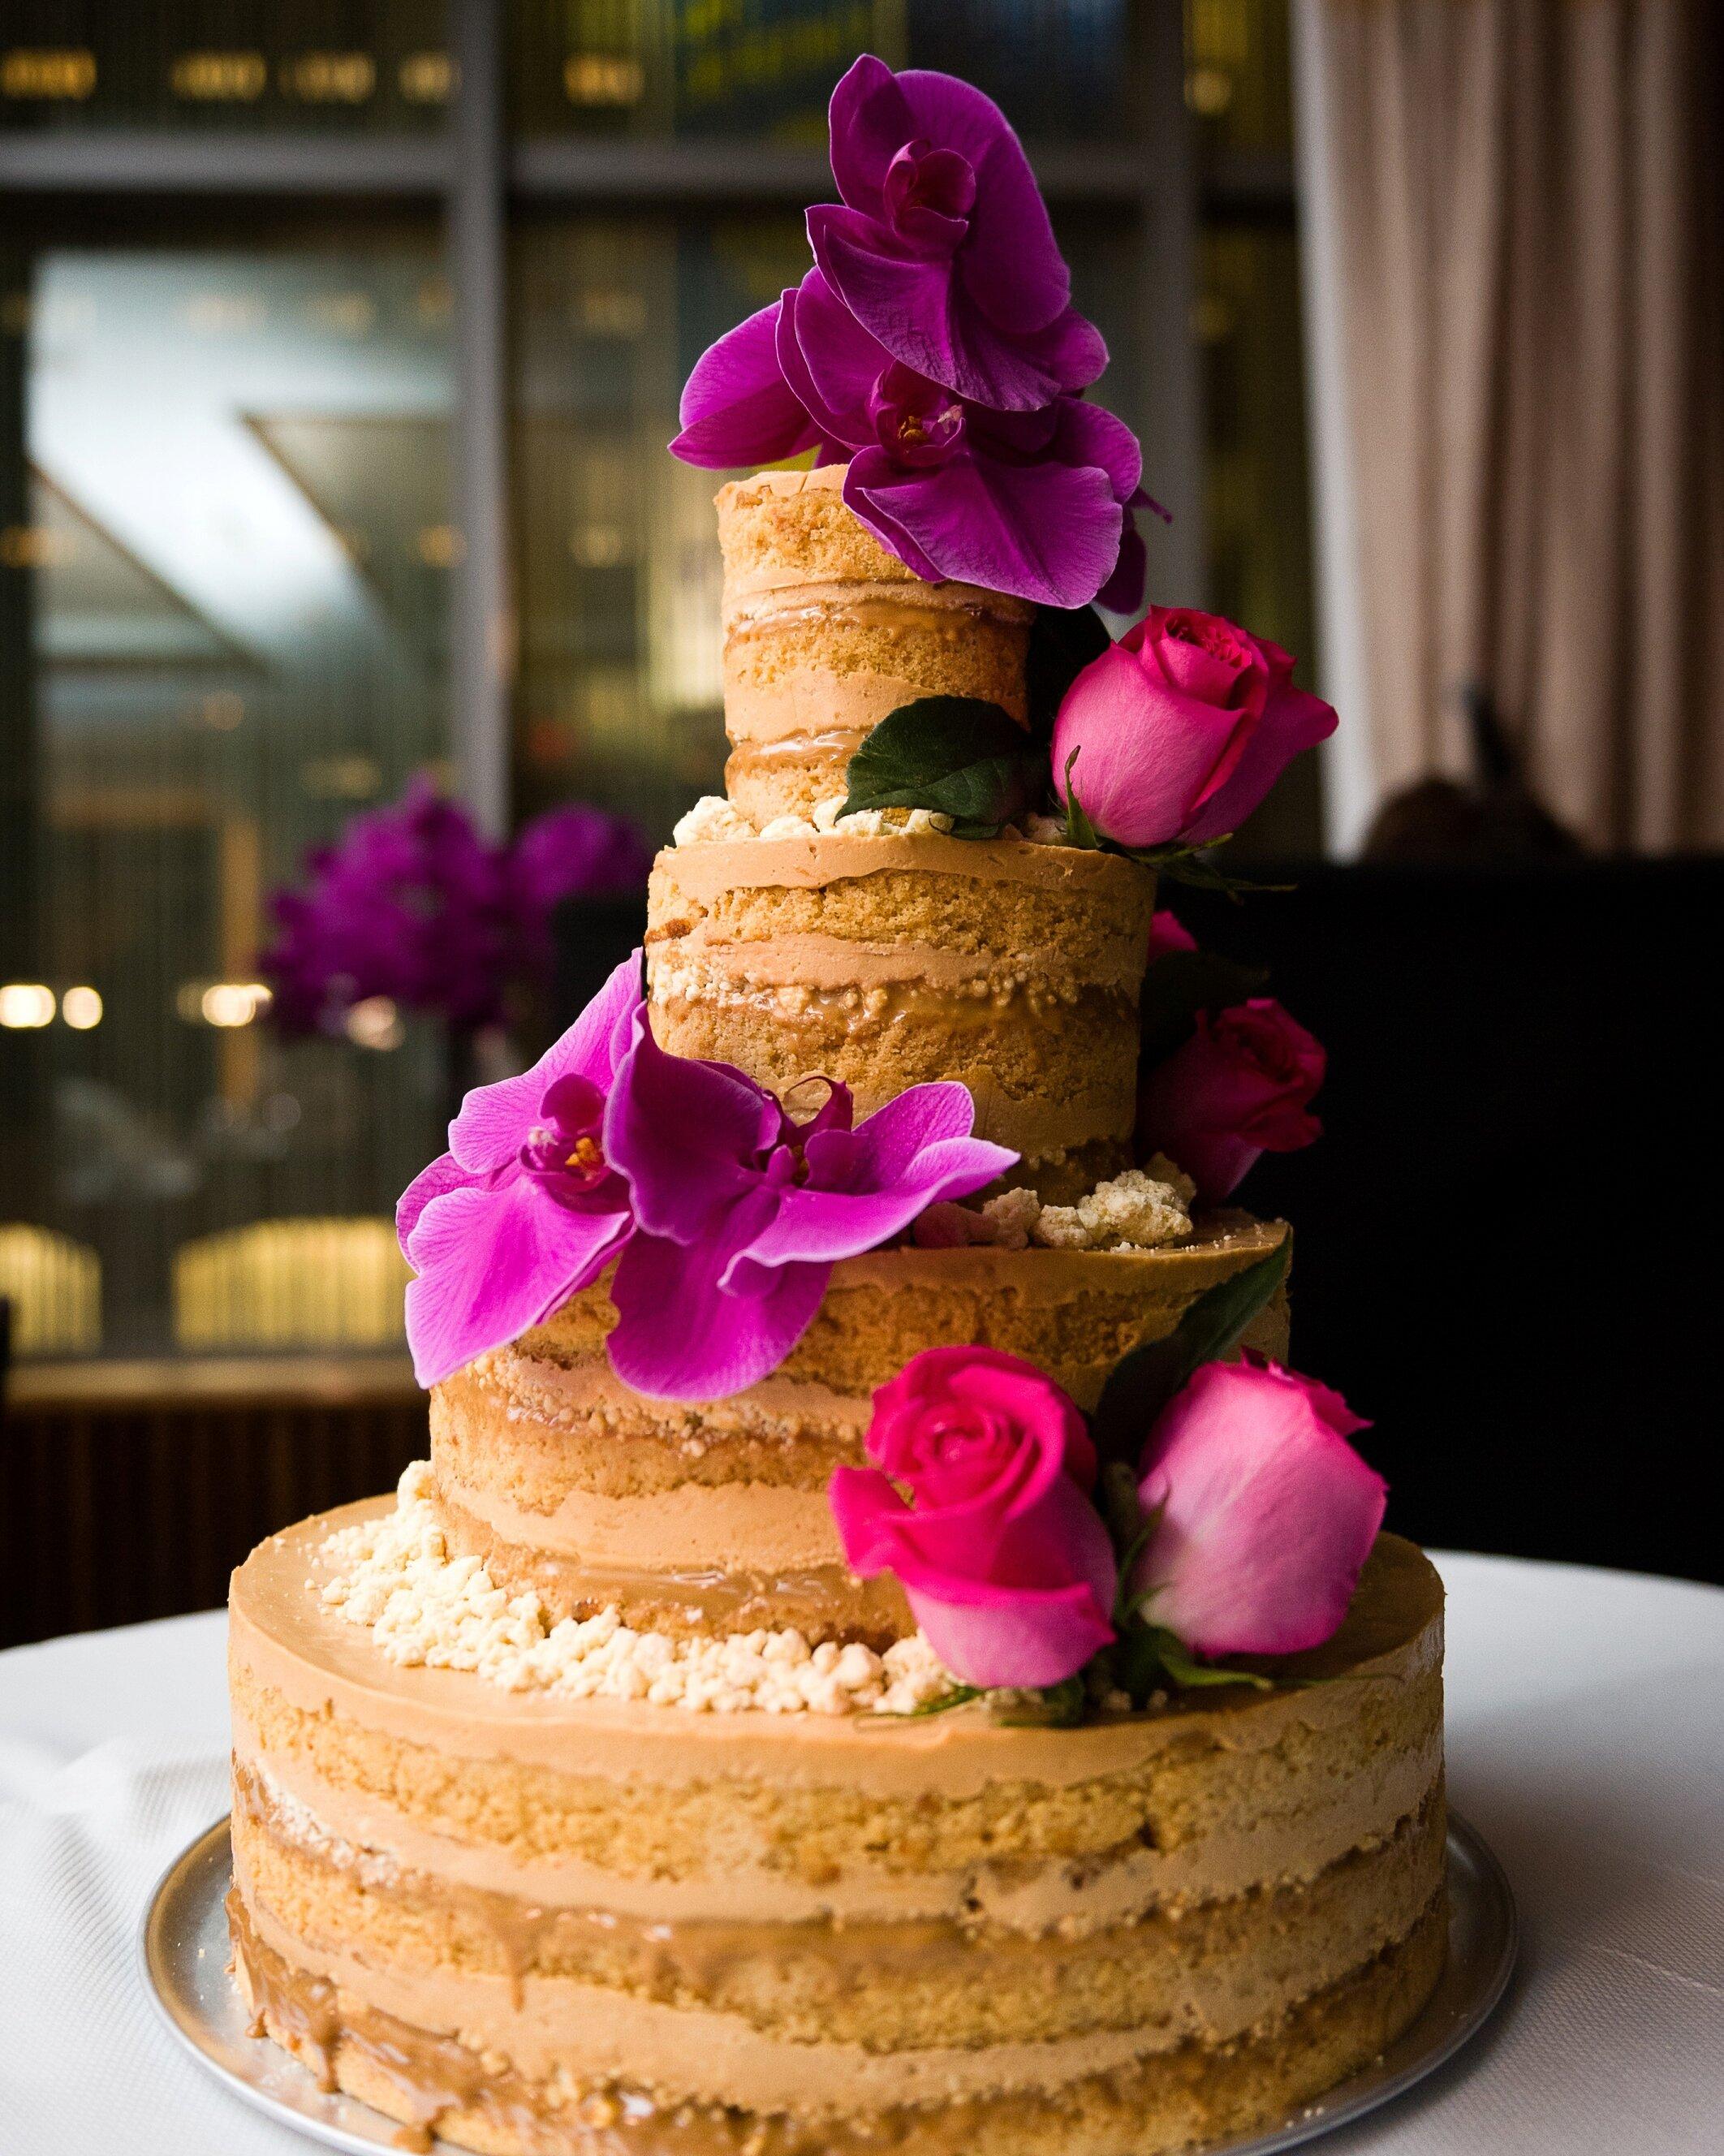 Groovy 5 Milk Bar Cakes That Are Sweet Sensations Martha Stewart Weddings Funny Birthday Cards Online Fluifree Goldxyz